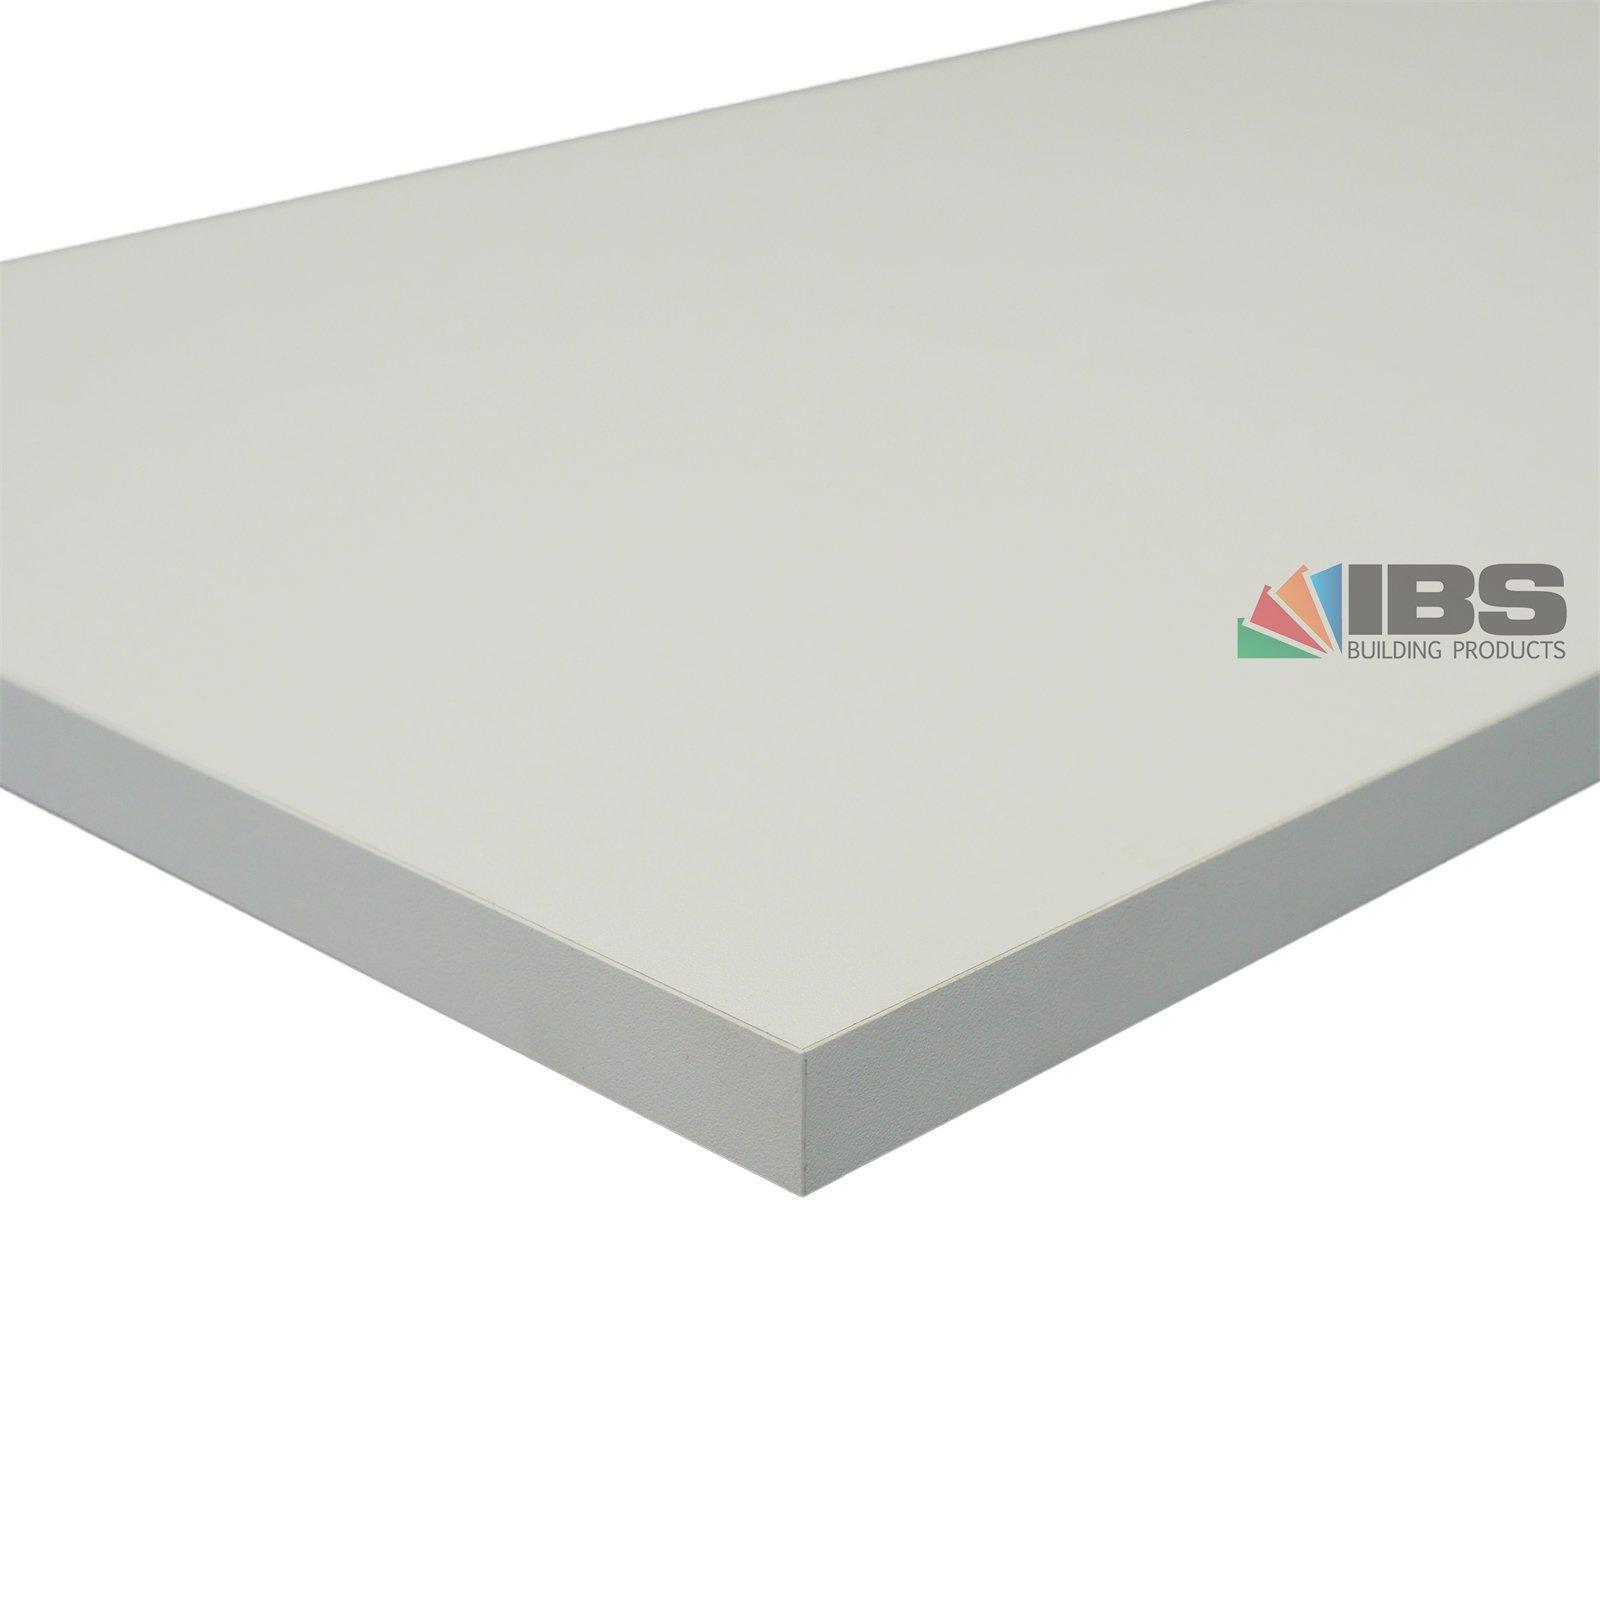 IBS Mini Panel 1800 x 300 x 16mm White Melamine